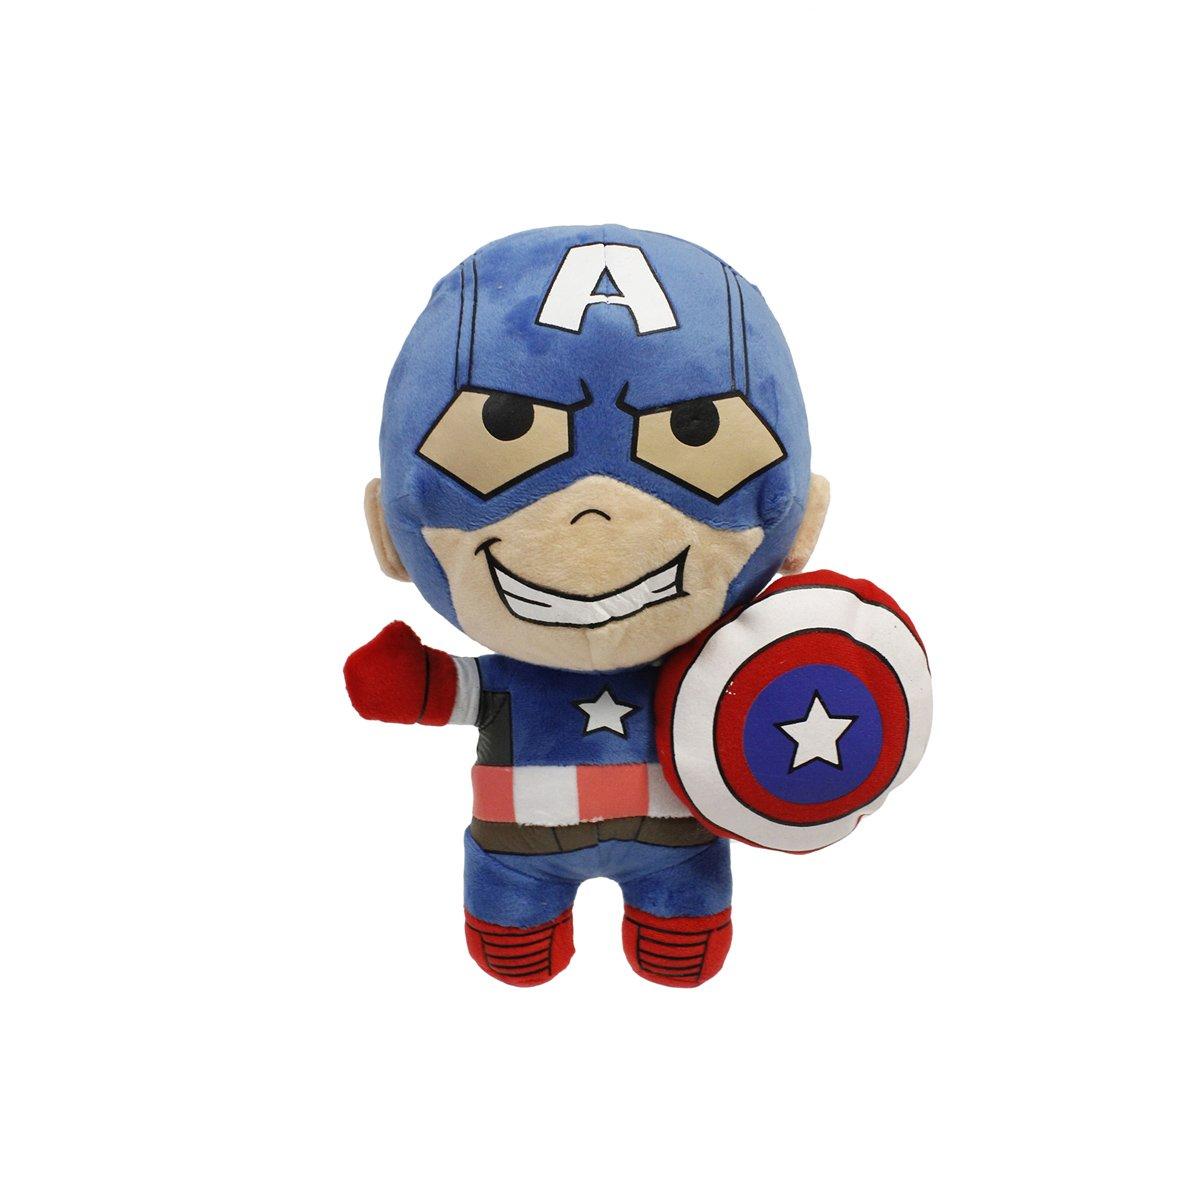 55d274995ee Peluche Capitán América Chico Disney